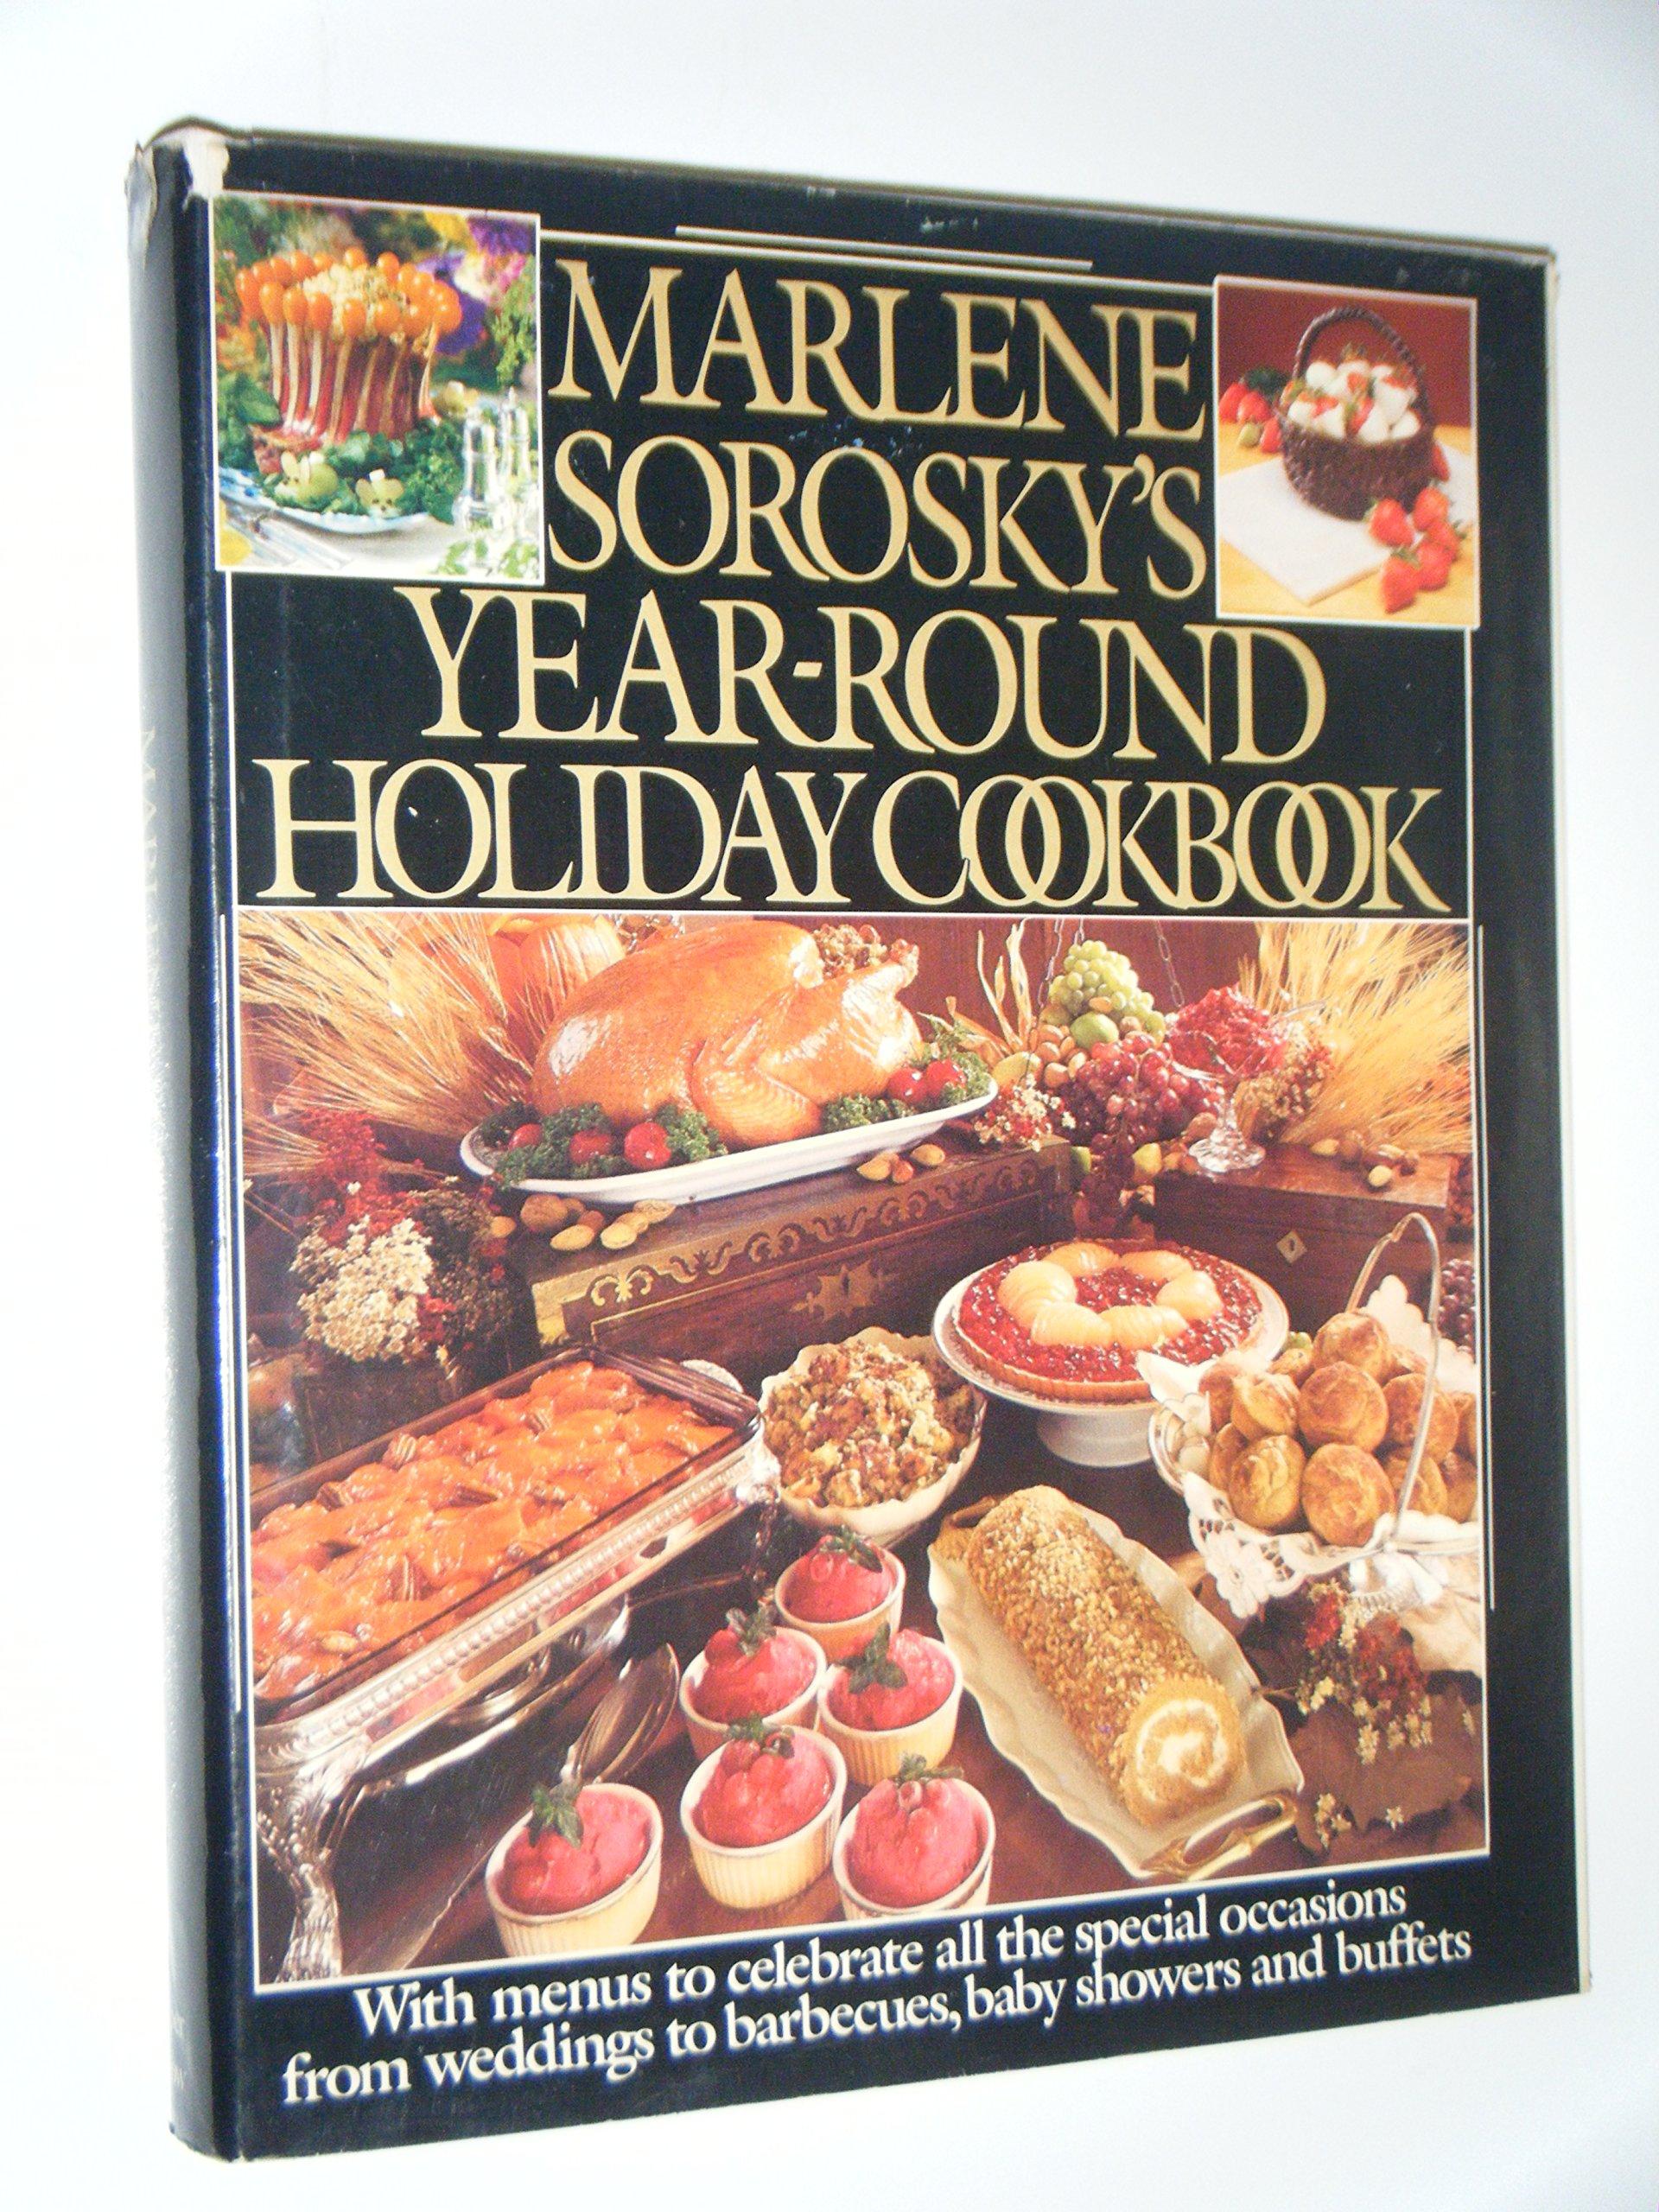 Marlene Sorosky's Yearround Holiday Cookbook